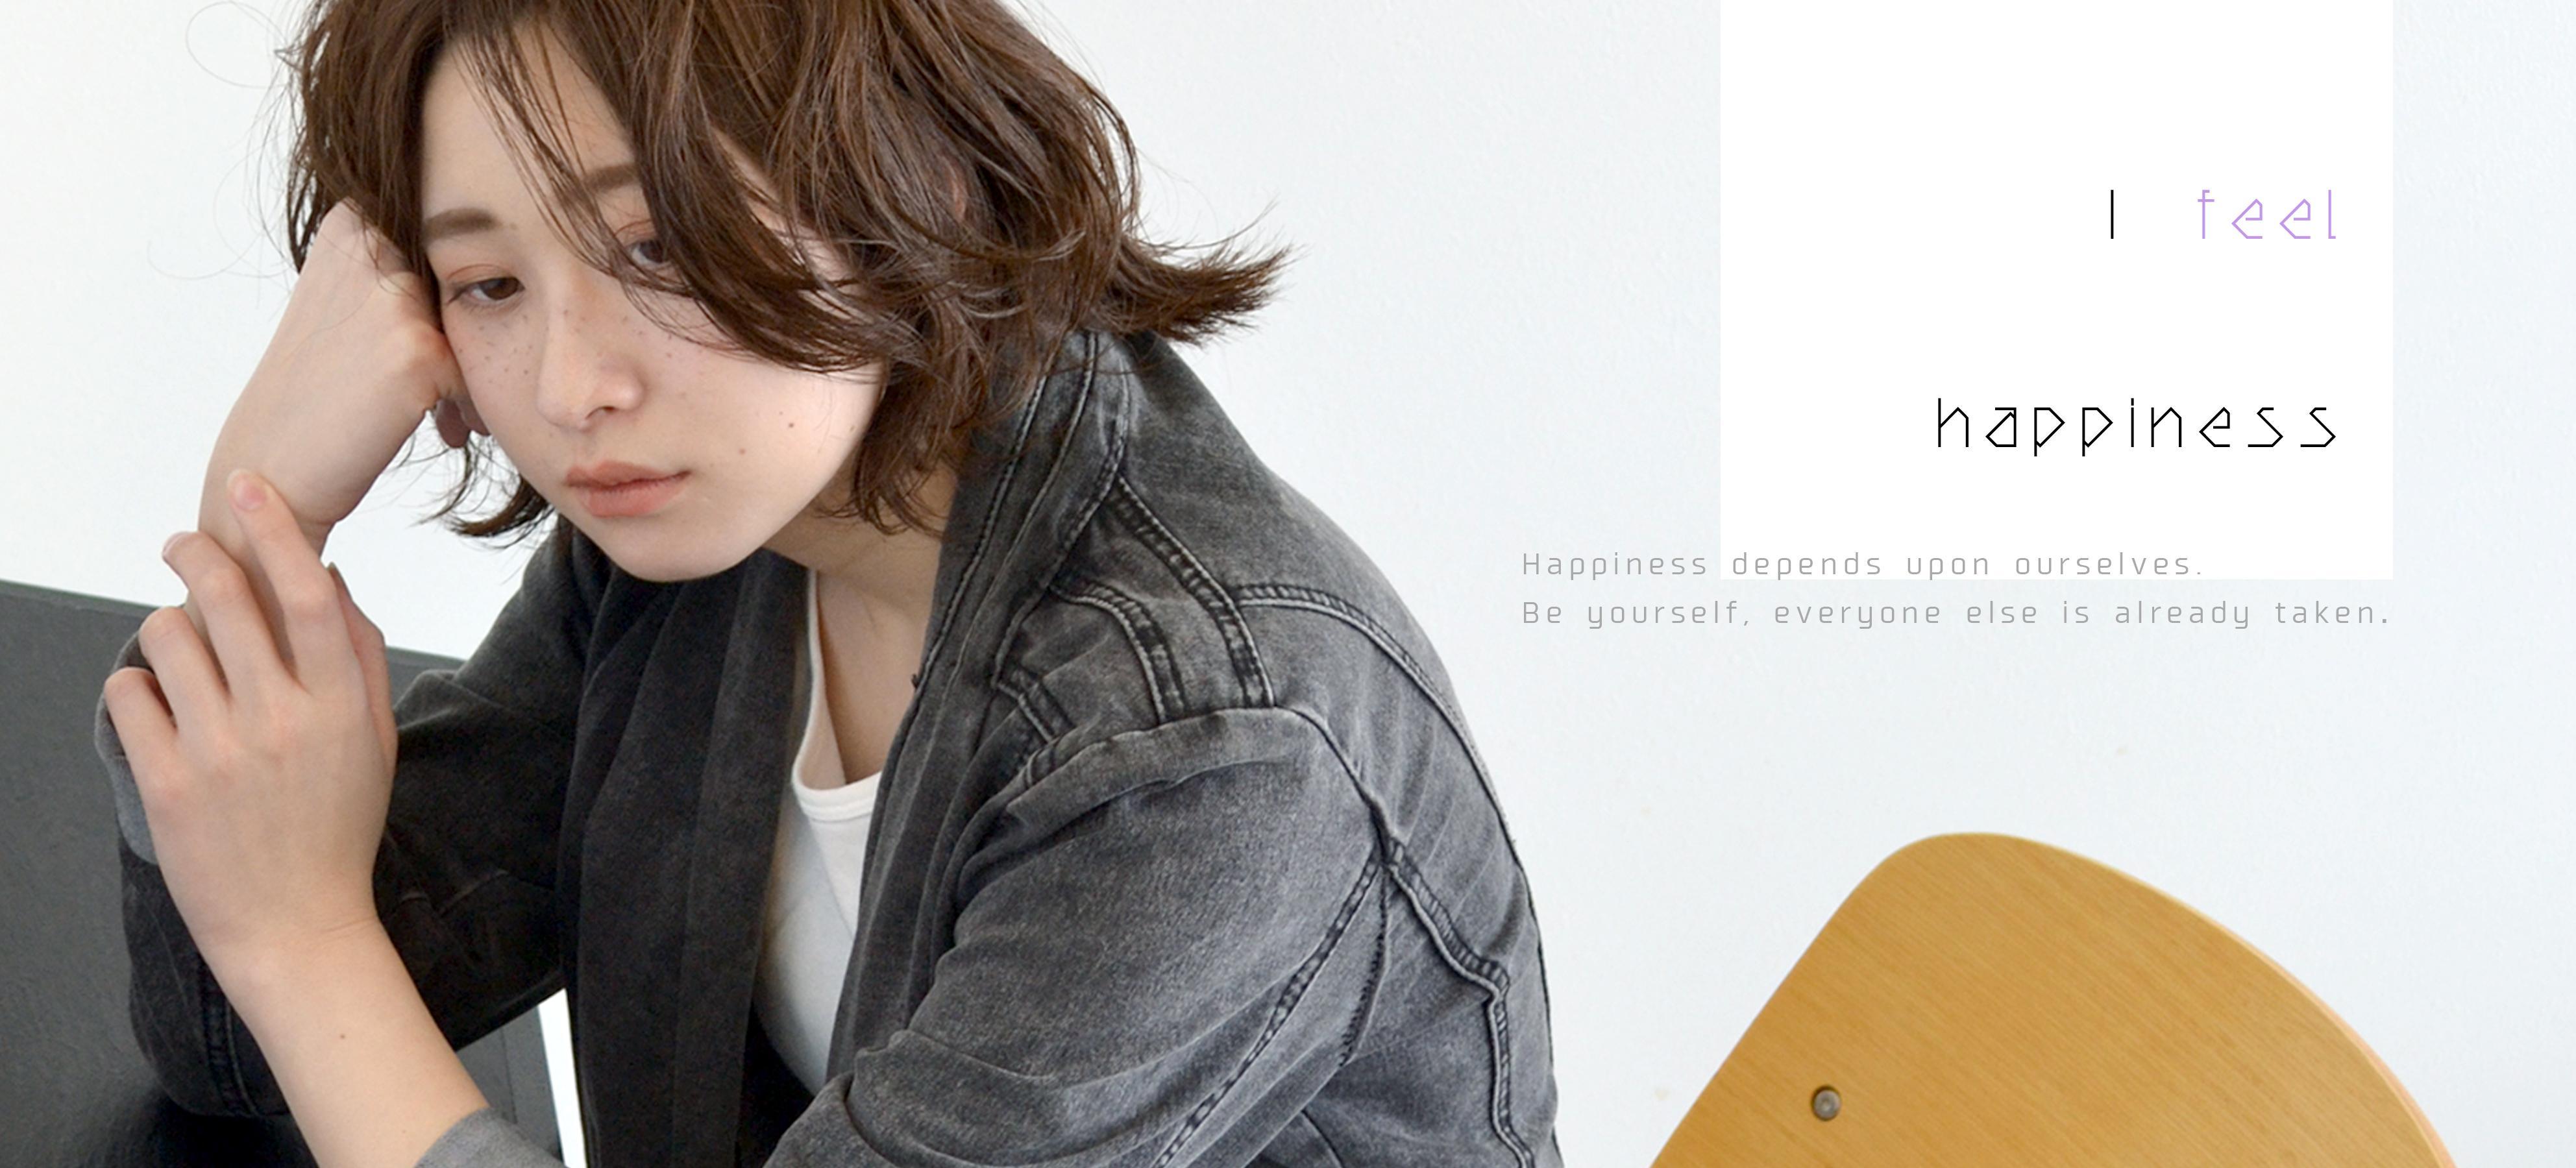 Ifh iizuka(イフ 飯塚)